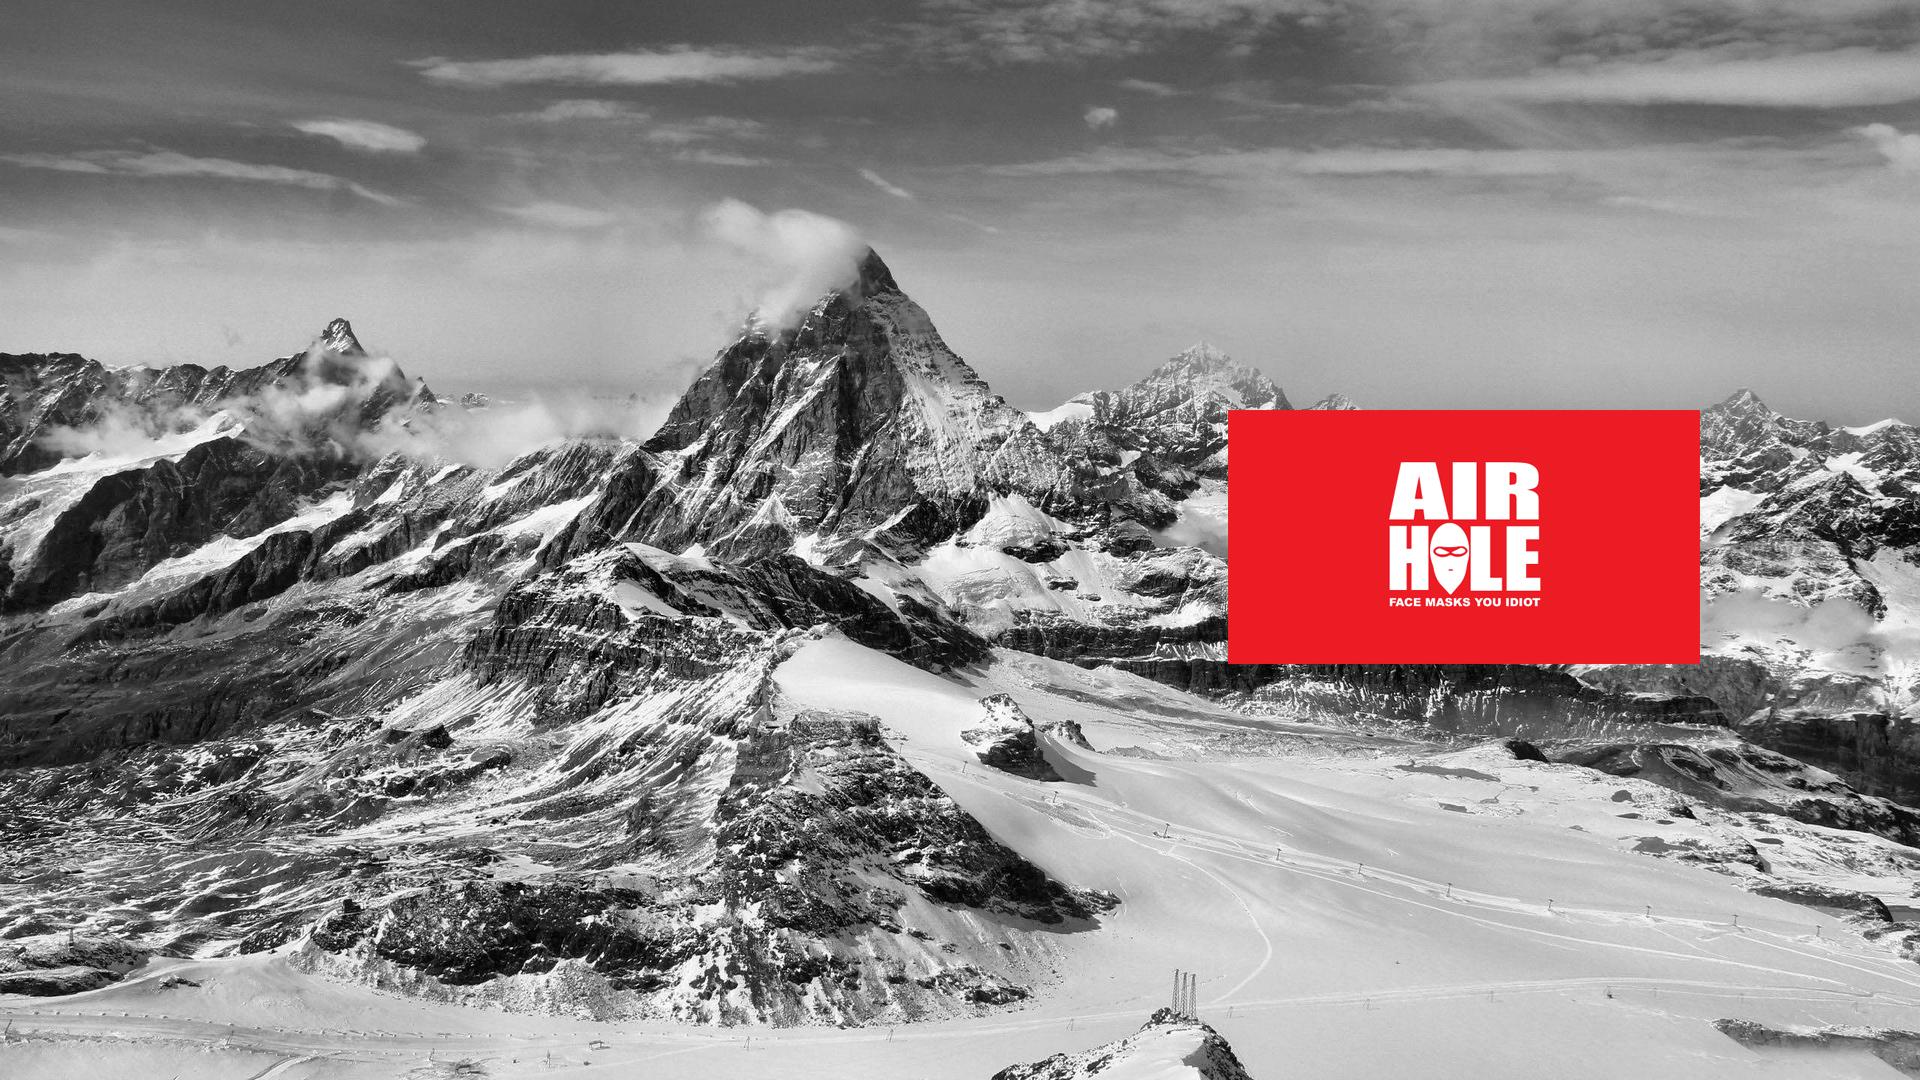 airhole-mountain